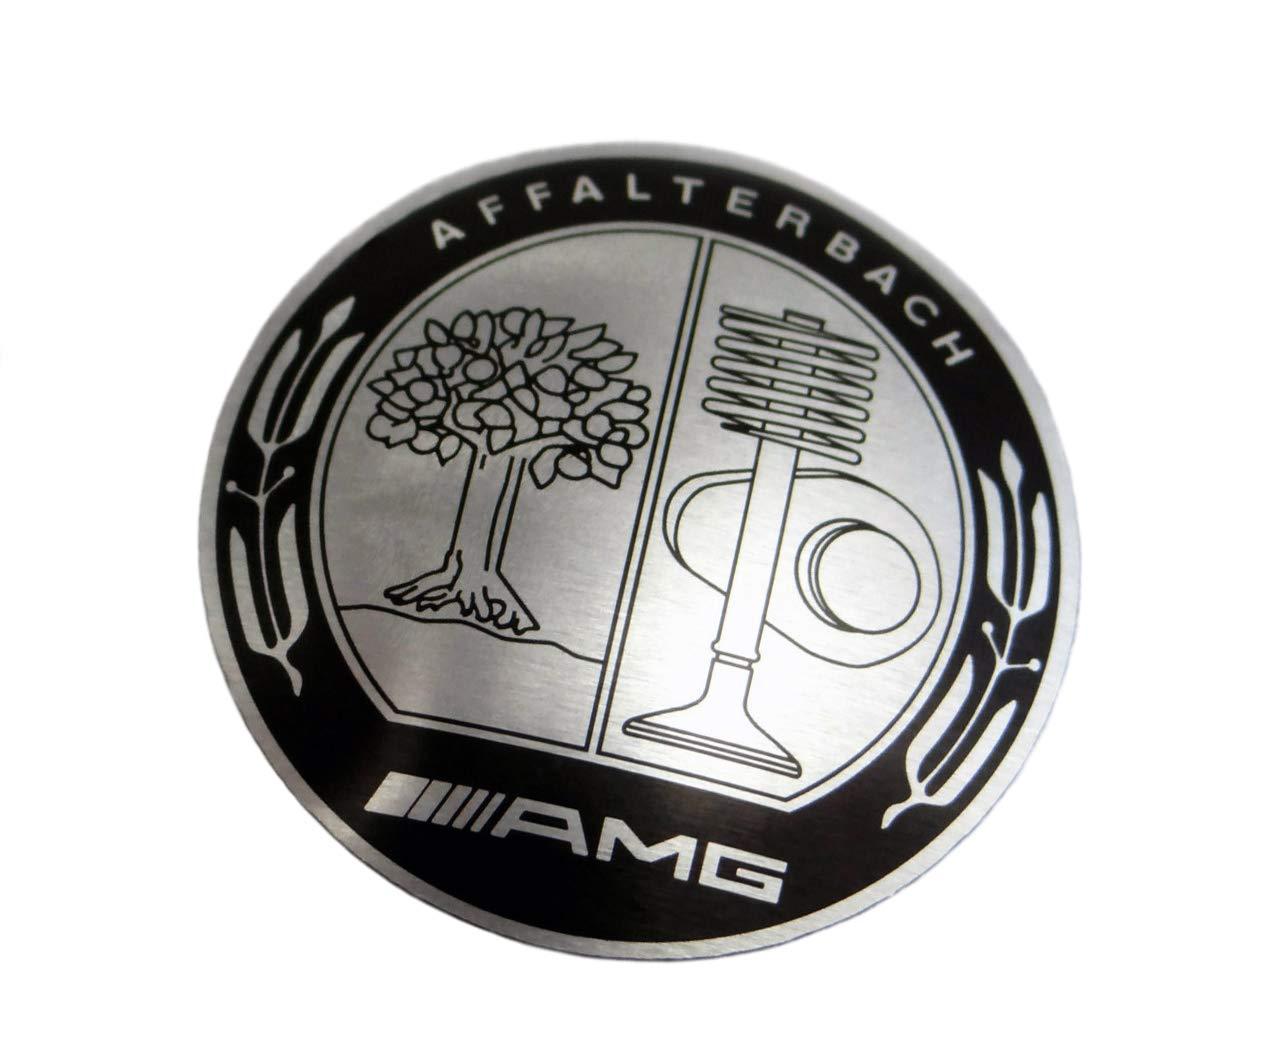 AMG Affalterbach style Logo - Shift Knob Emblem - Badge for gear shifter knob - for Mercedes-Benz vehicles - 1 pc - diameter 1 7/64 inch - 2,8 cm